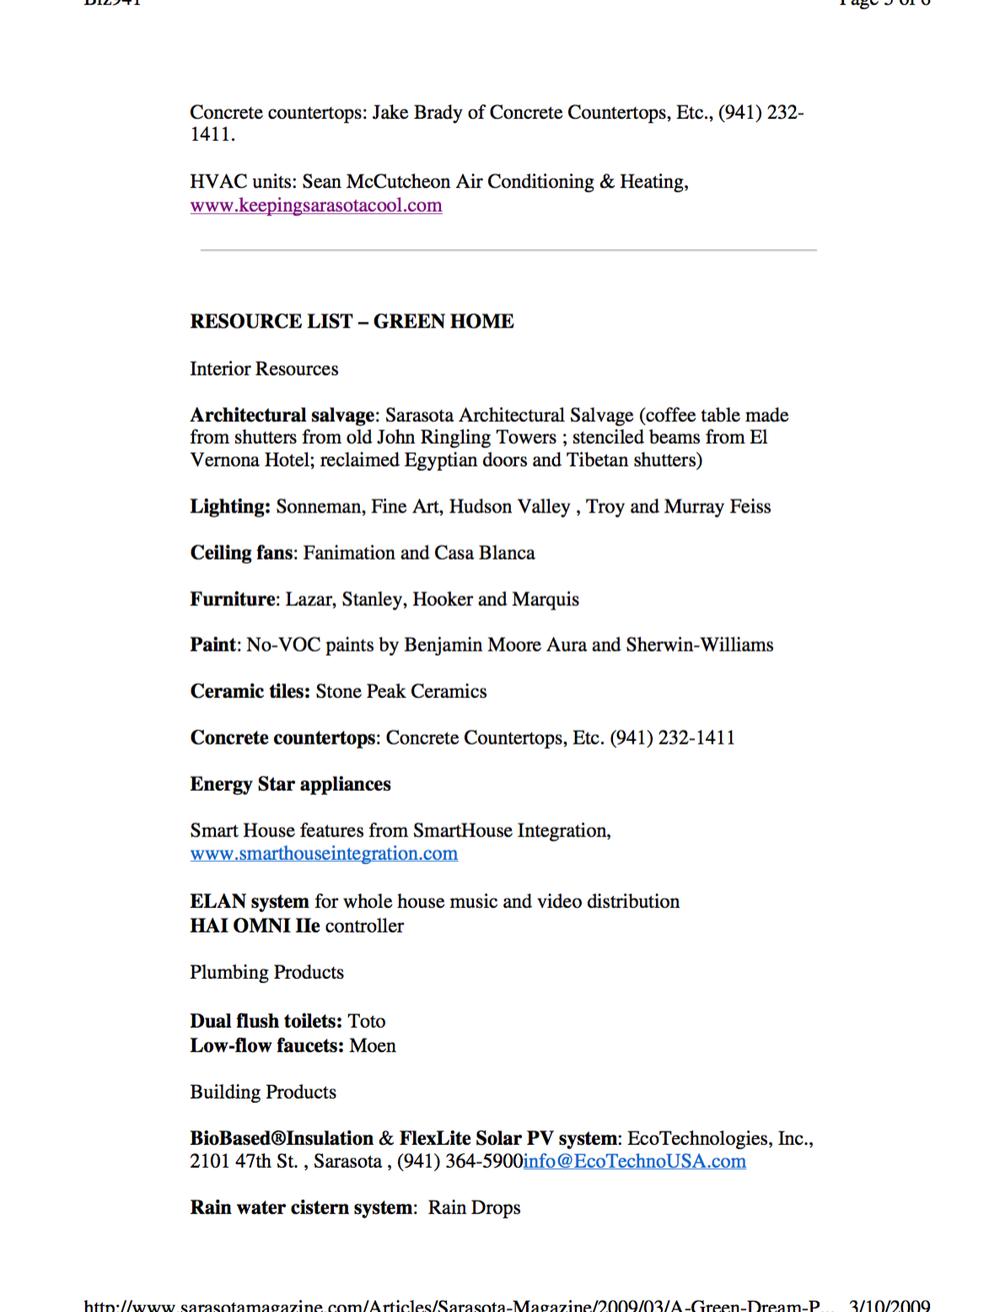 sarasota-magazine-green-dream_pdf 5.png